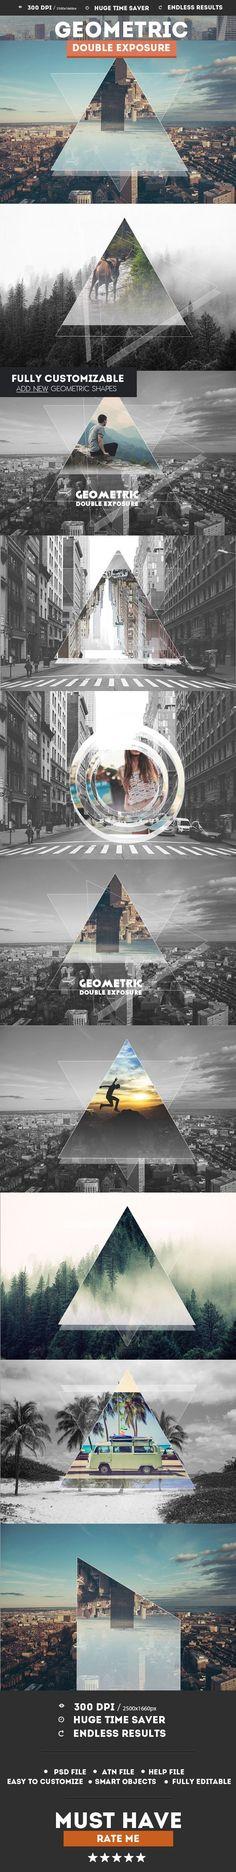 Geometric Double Exposure Photoshop Creator - Photo Effects Actions. Photoshop tips. Nordic360.